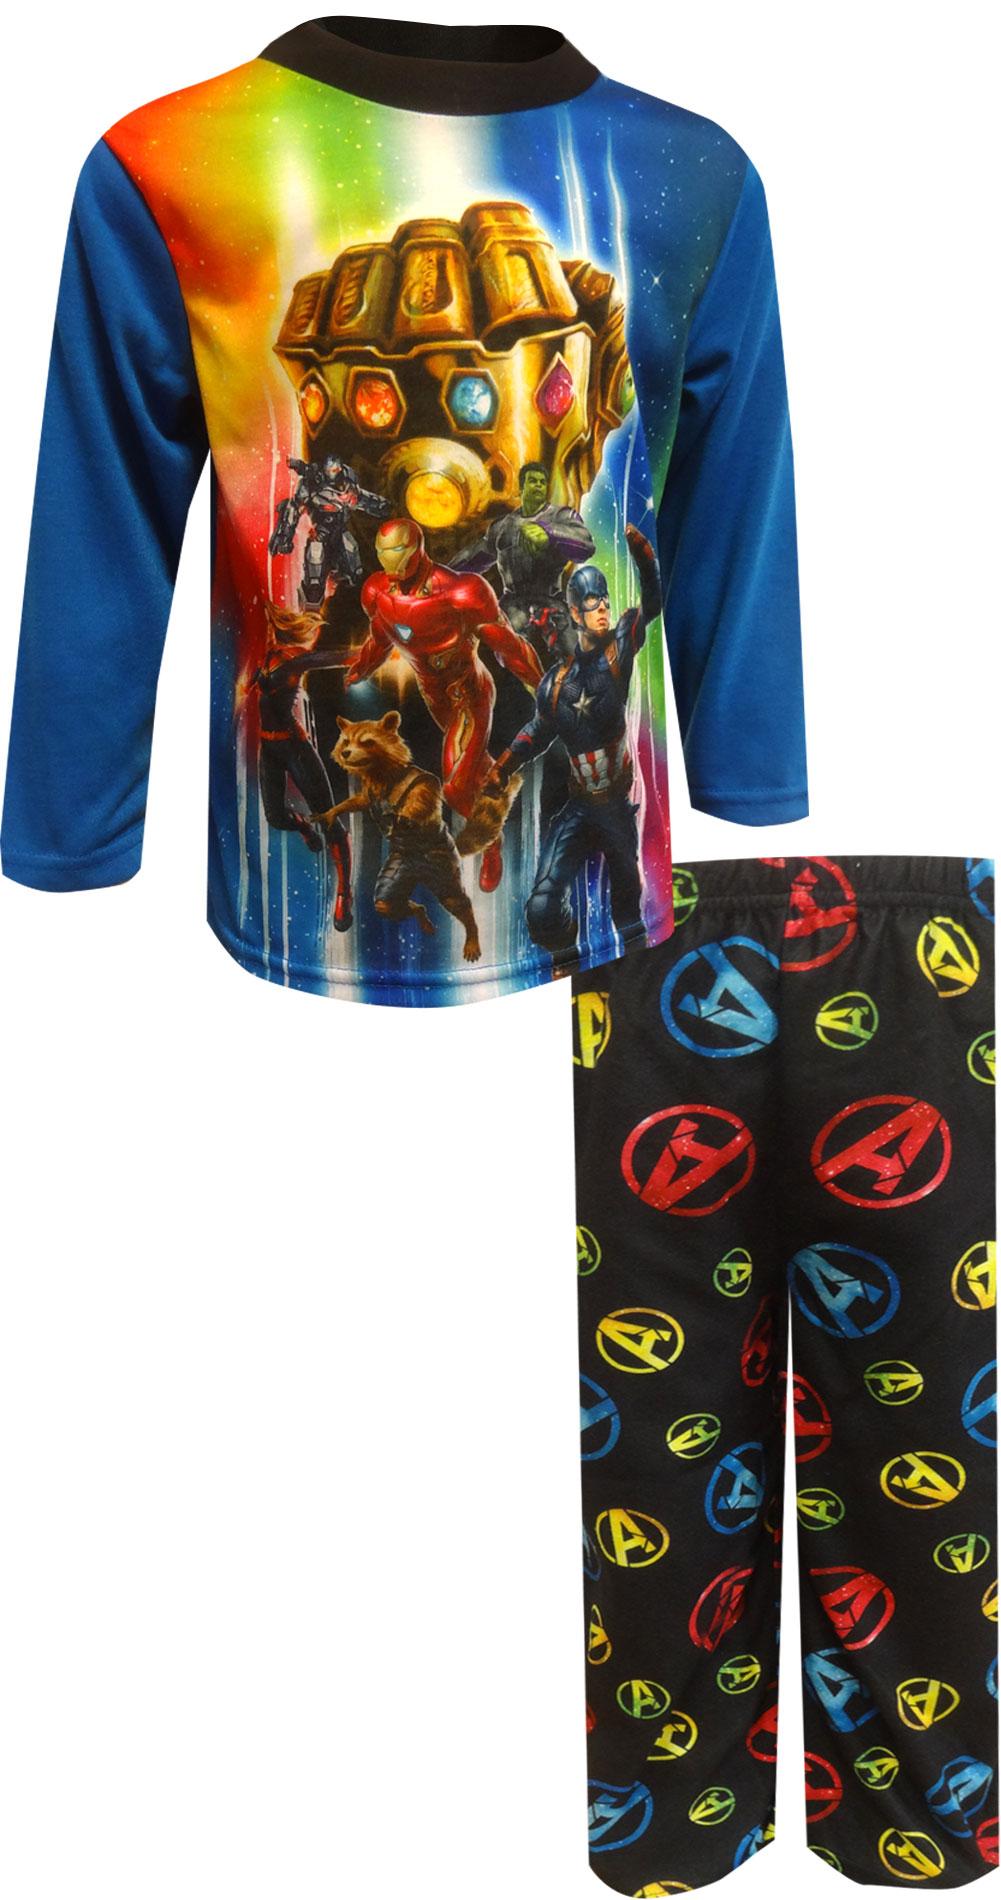 Image of Marvel Comics Avengers Endgame Infinity Gauntlet Pajamas for boys